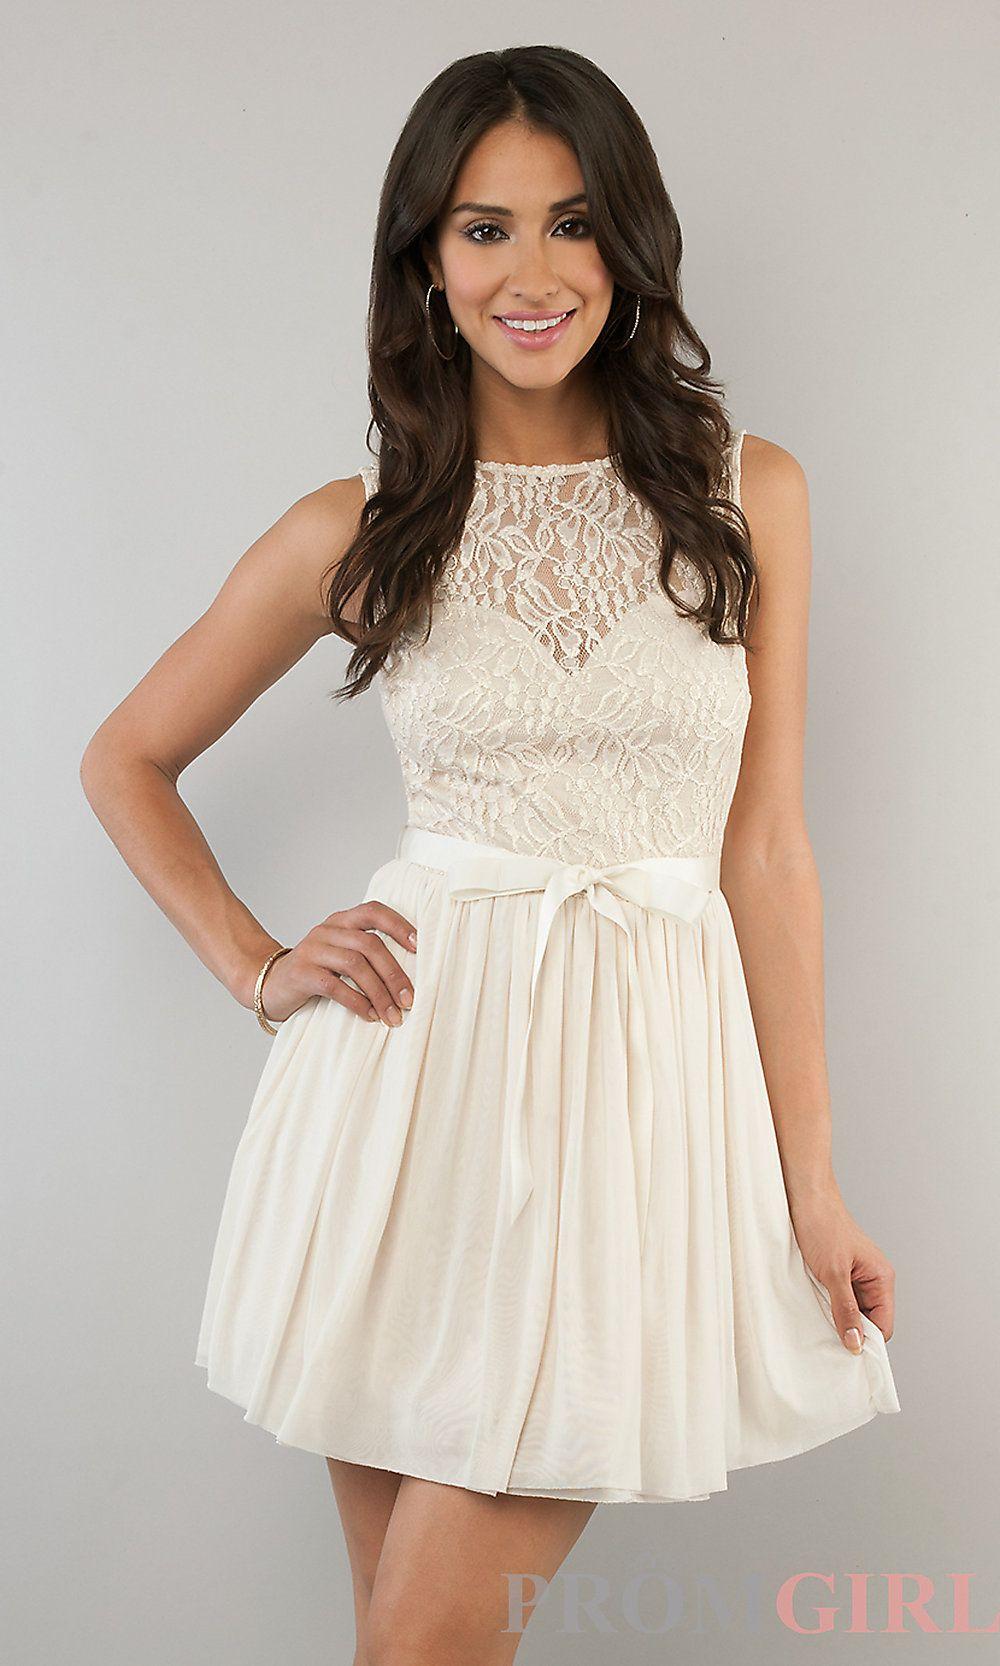 8c431ce52 Short Sleeveless Lace Dress, Lace Junior Prom Dresses- PromGirl ...